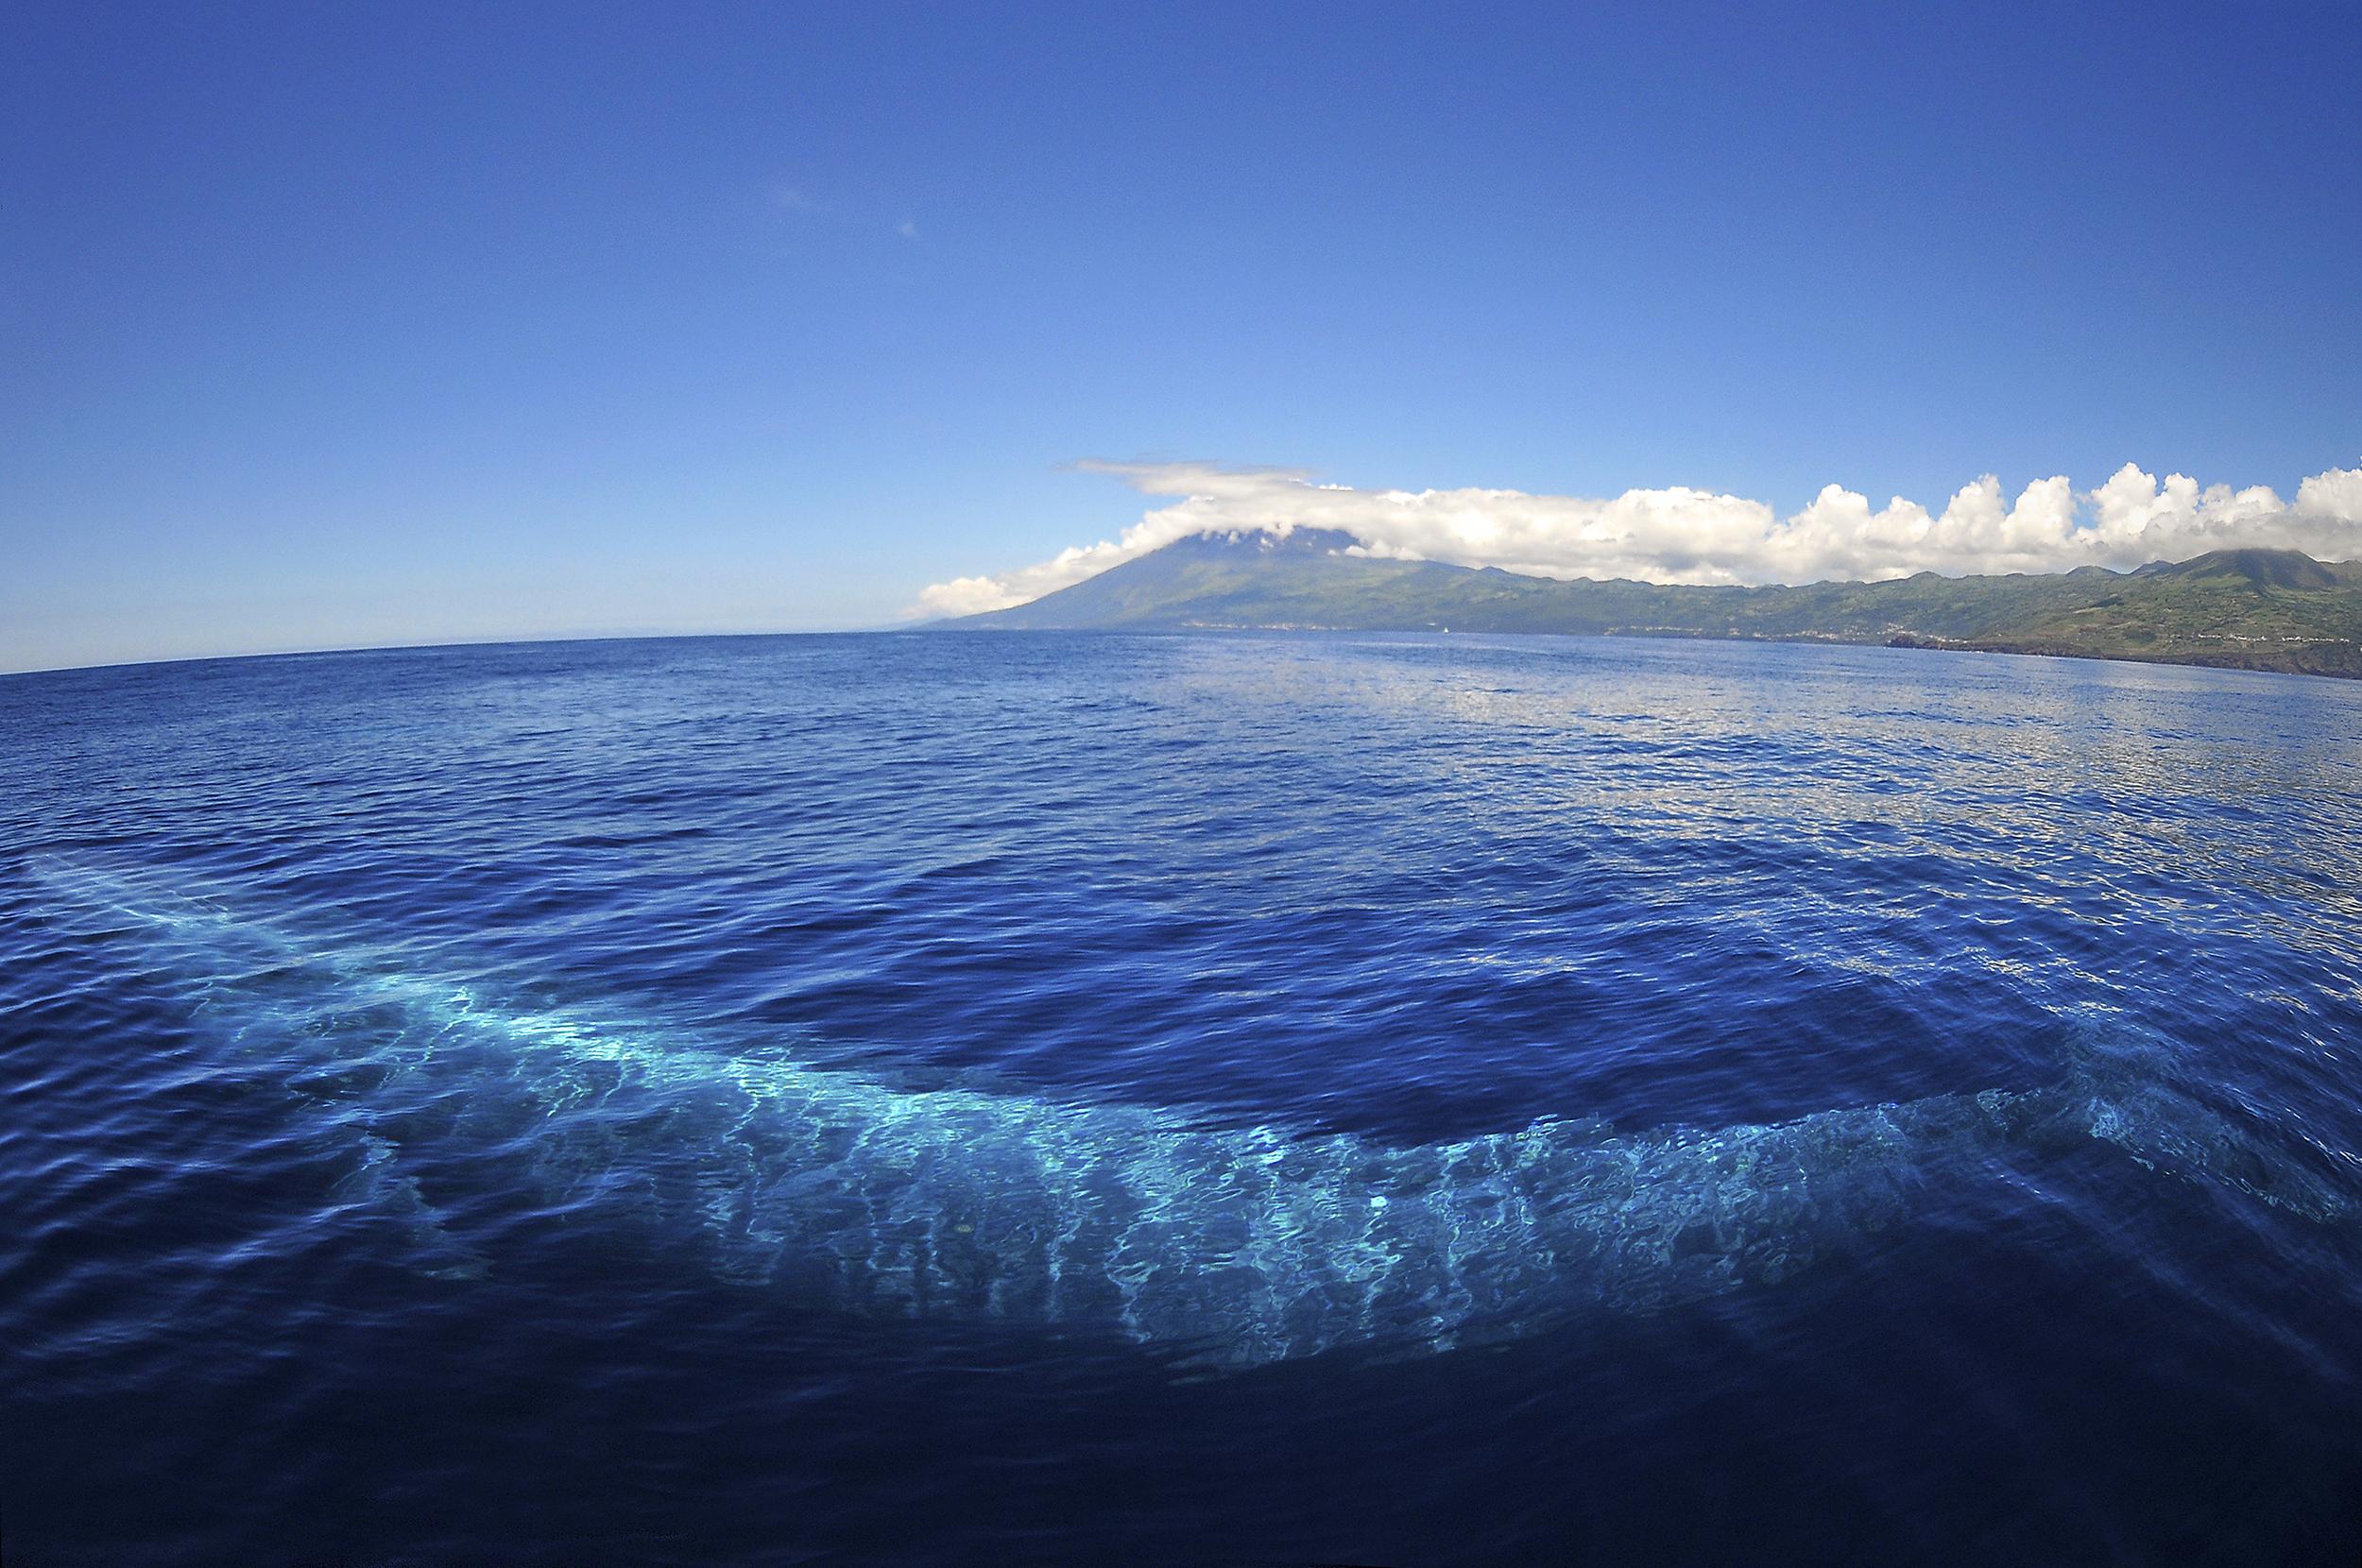 Blue whale & Pico mount